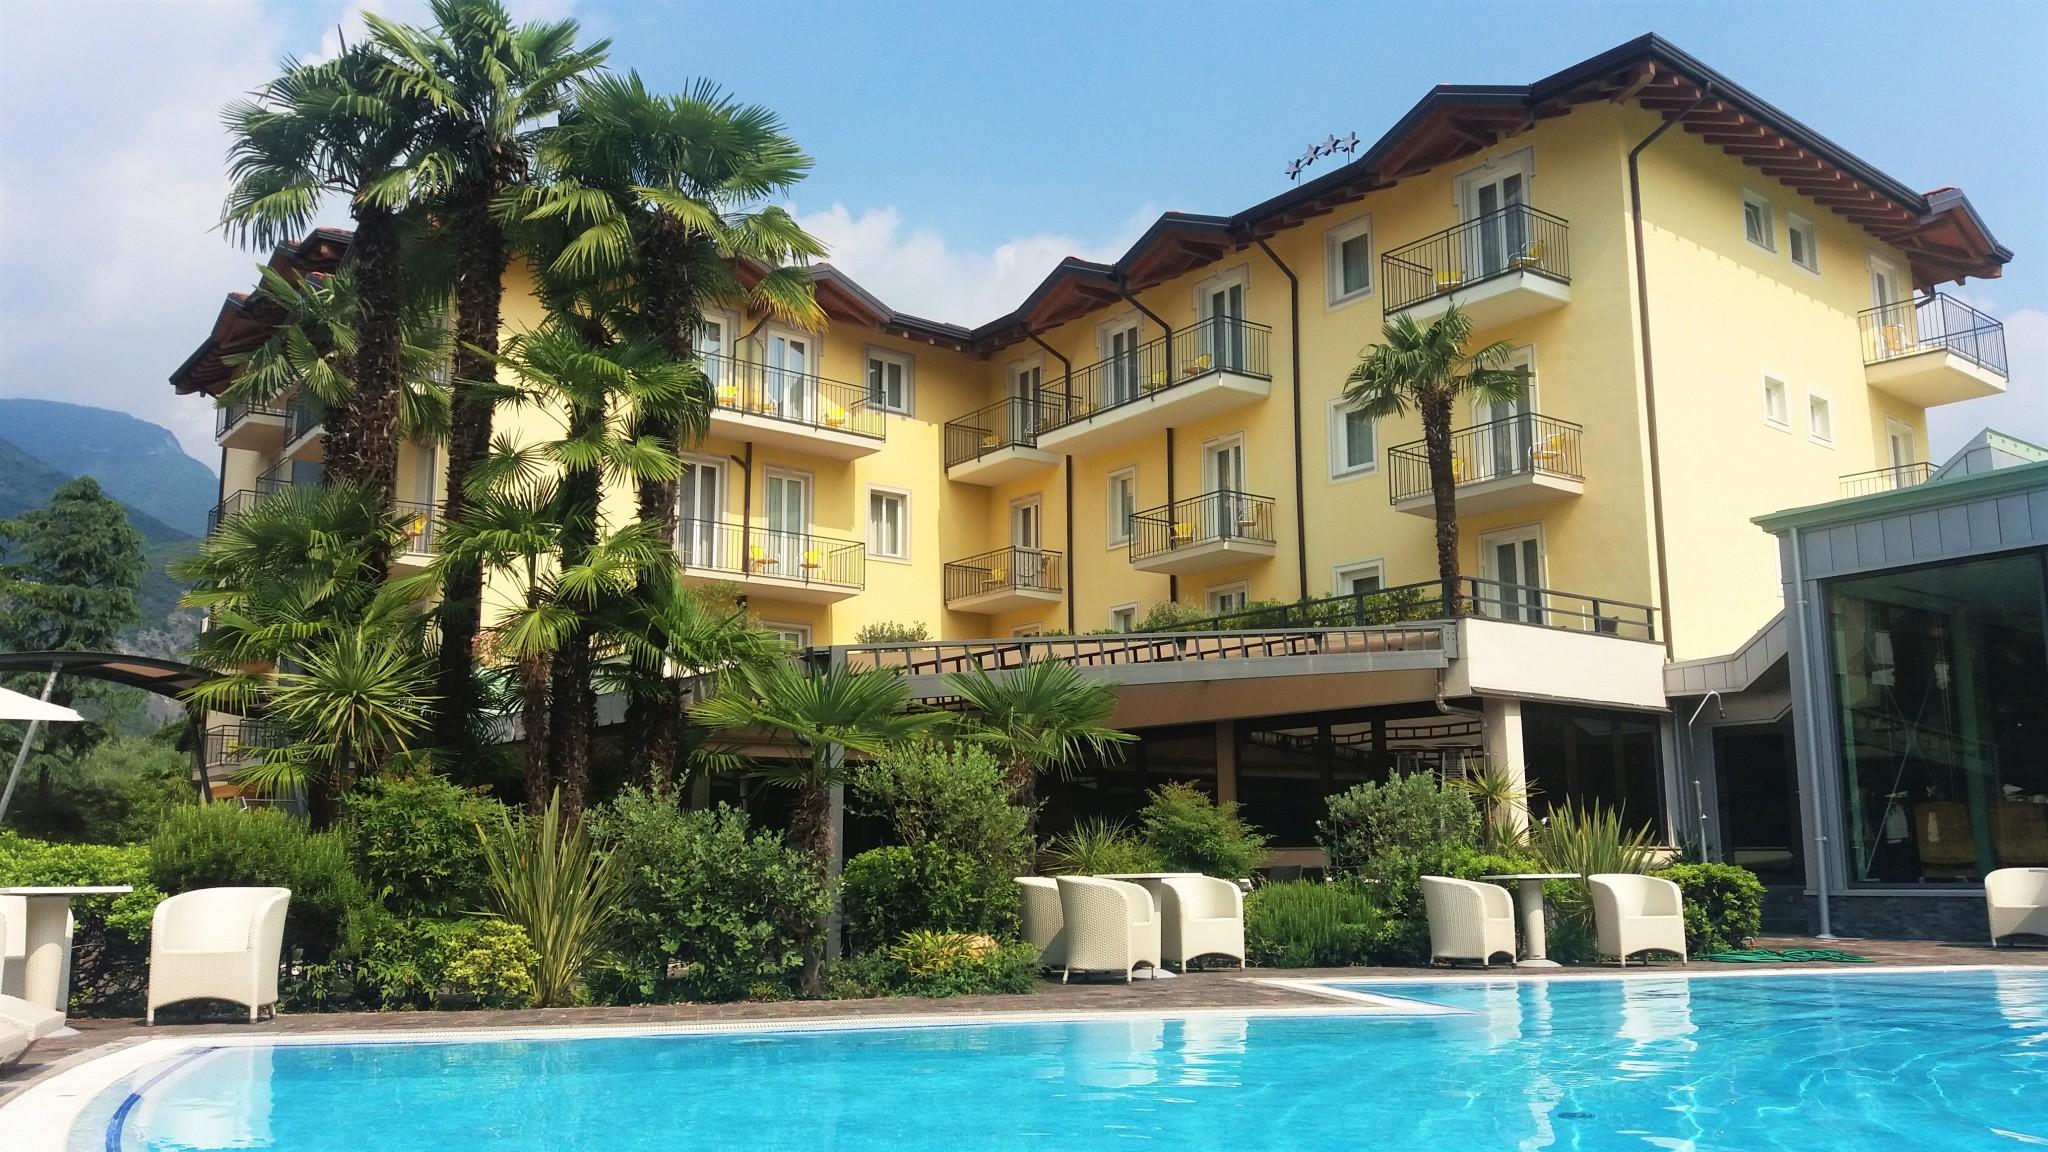 Hotel Villa Nicolli Romantic Resort